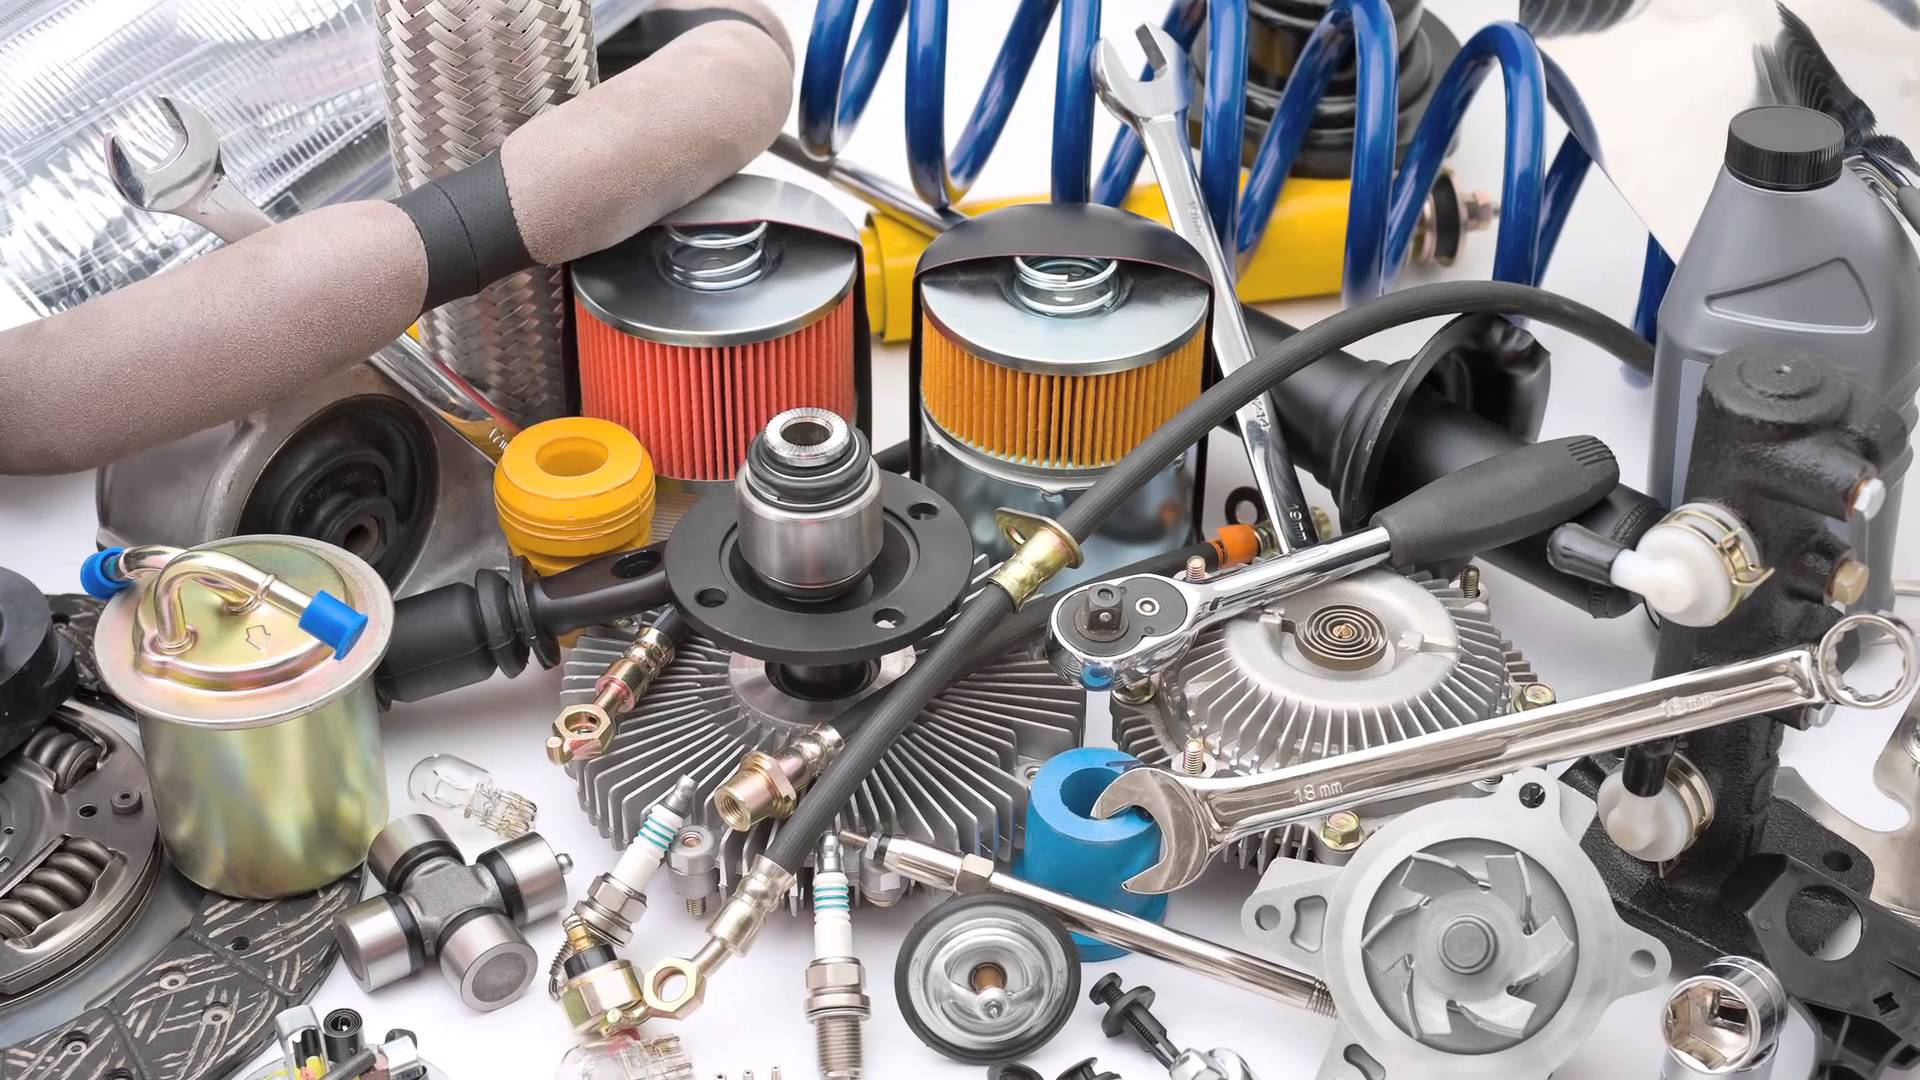 Auto Parts 1920x1080